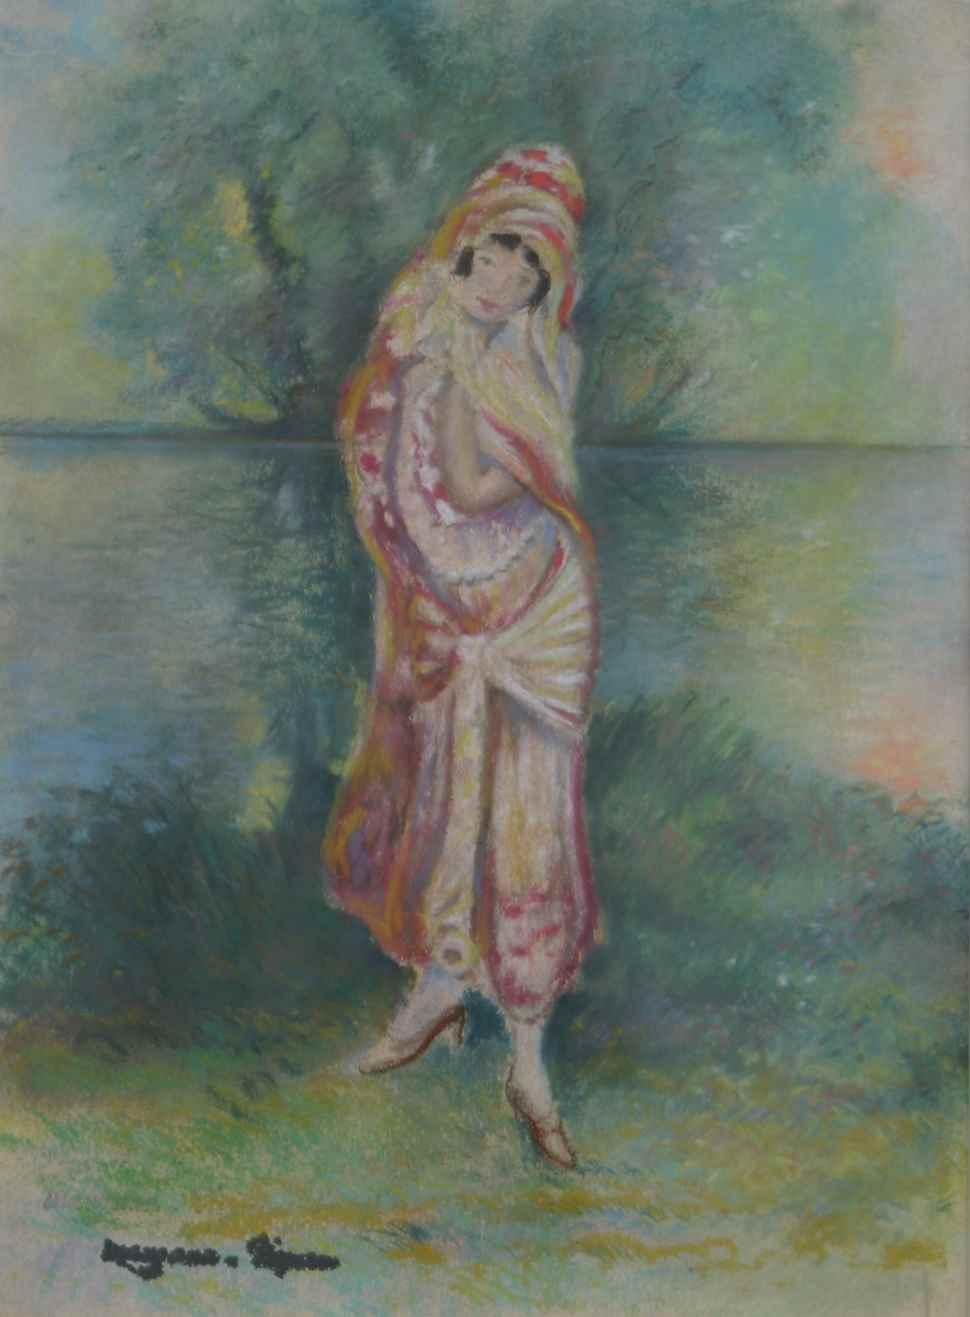 Femme en Costume Oriental - Georges Manzana Pissarro (1871 - 1961)